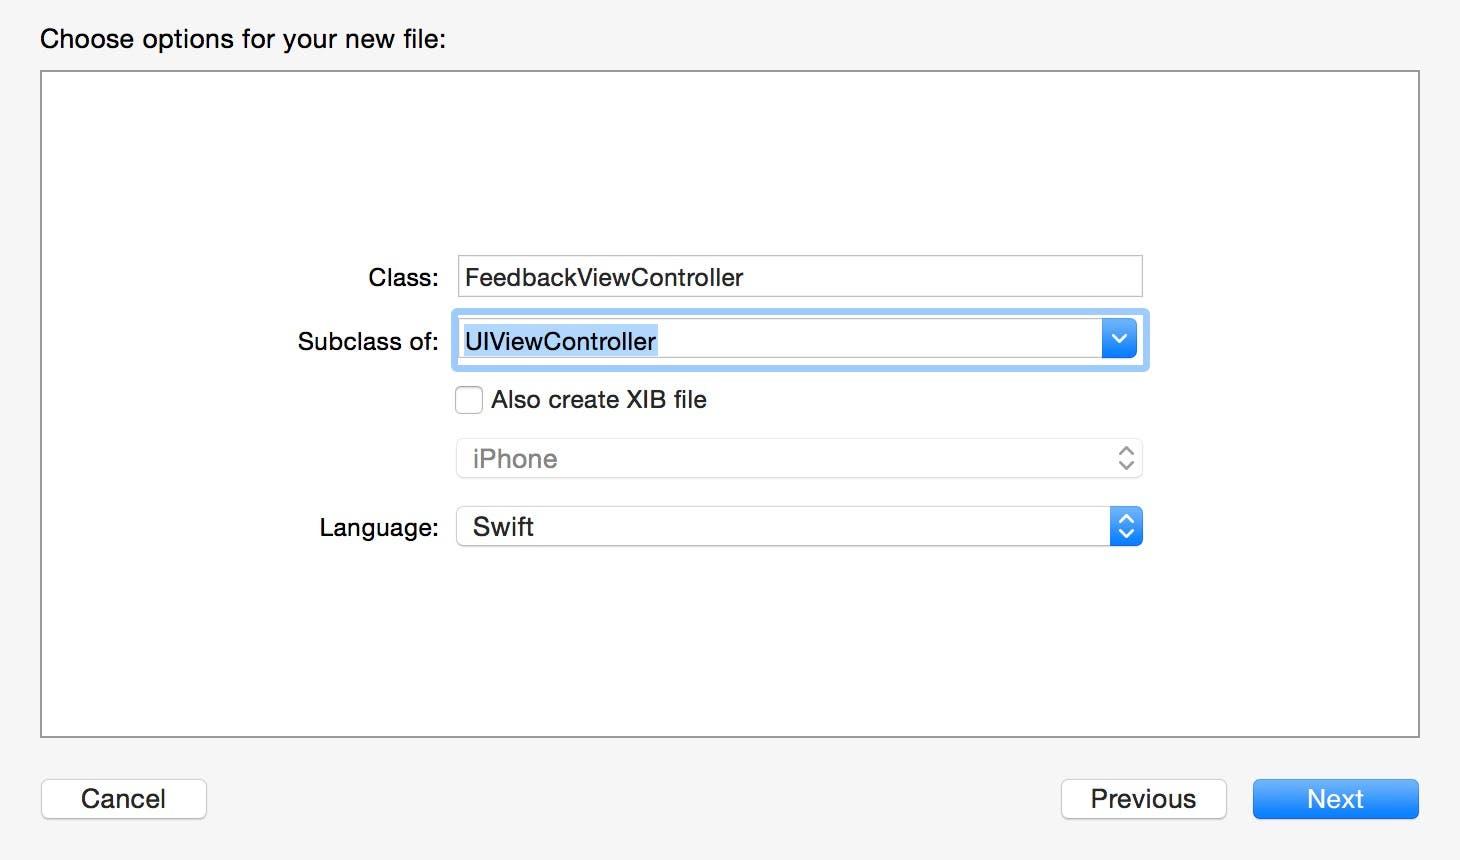 Create a new FeedbackViewController class.